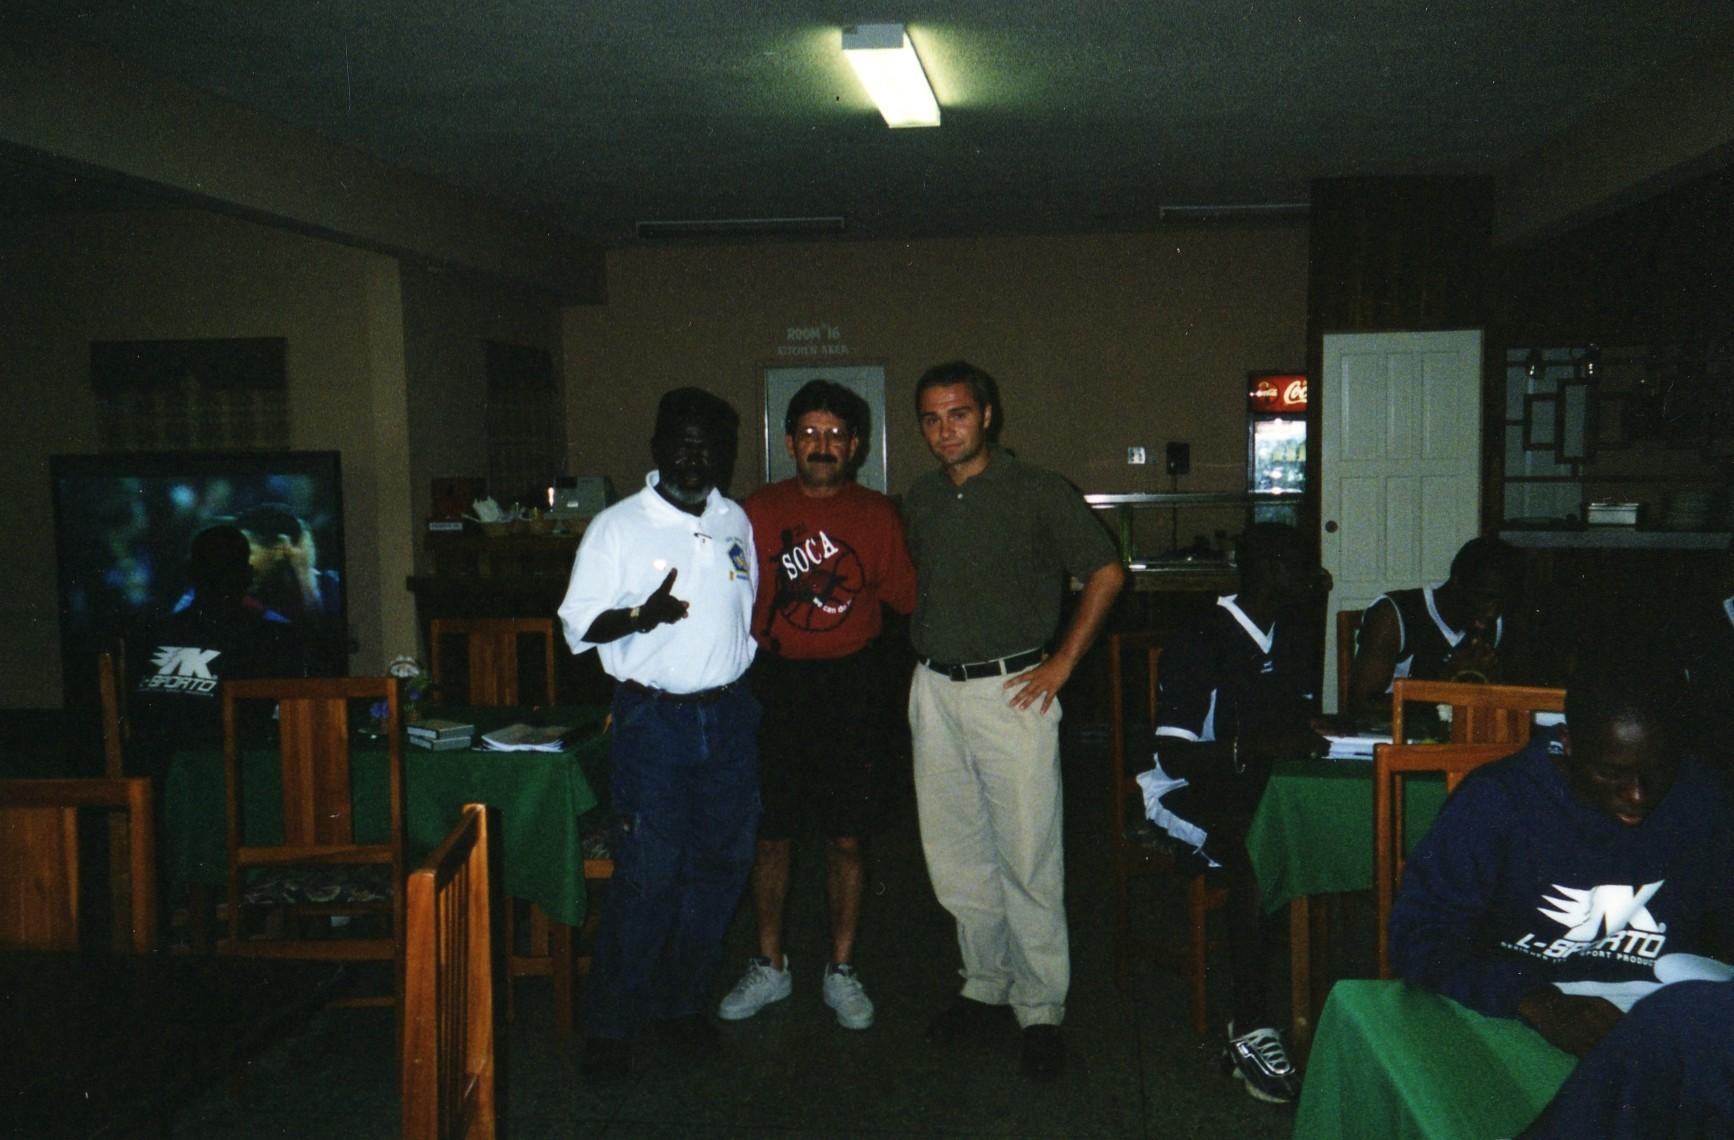 With Rene Simoes